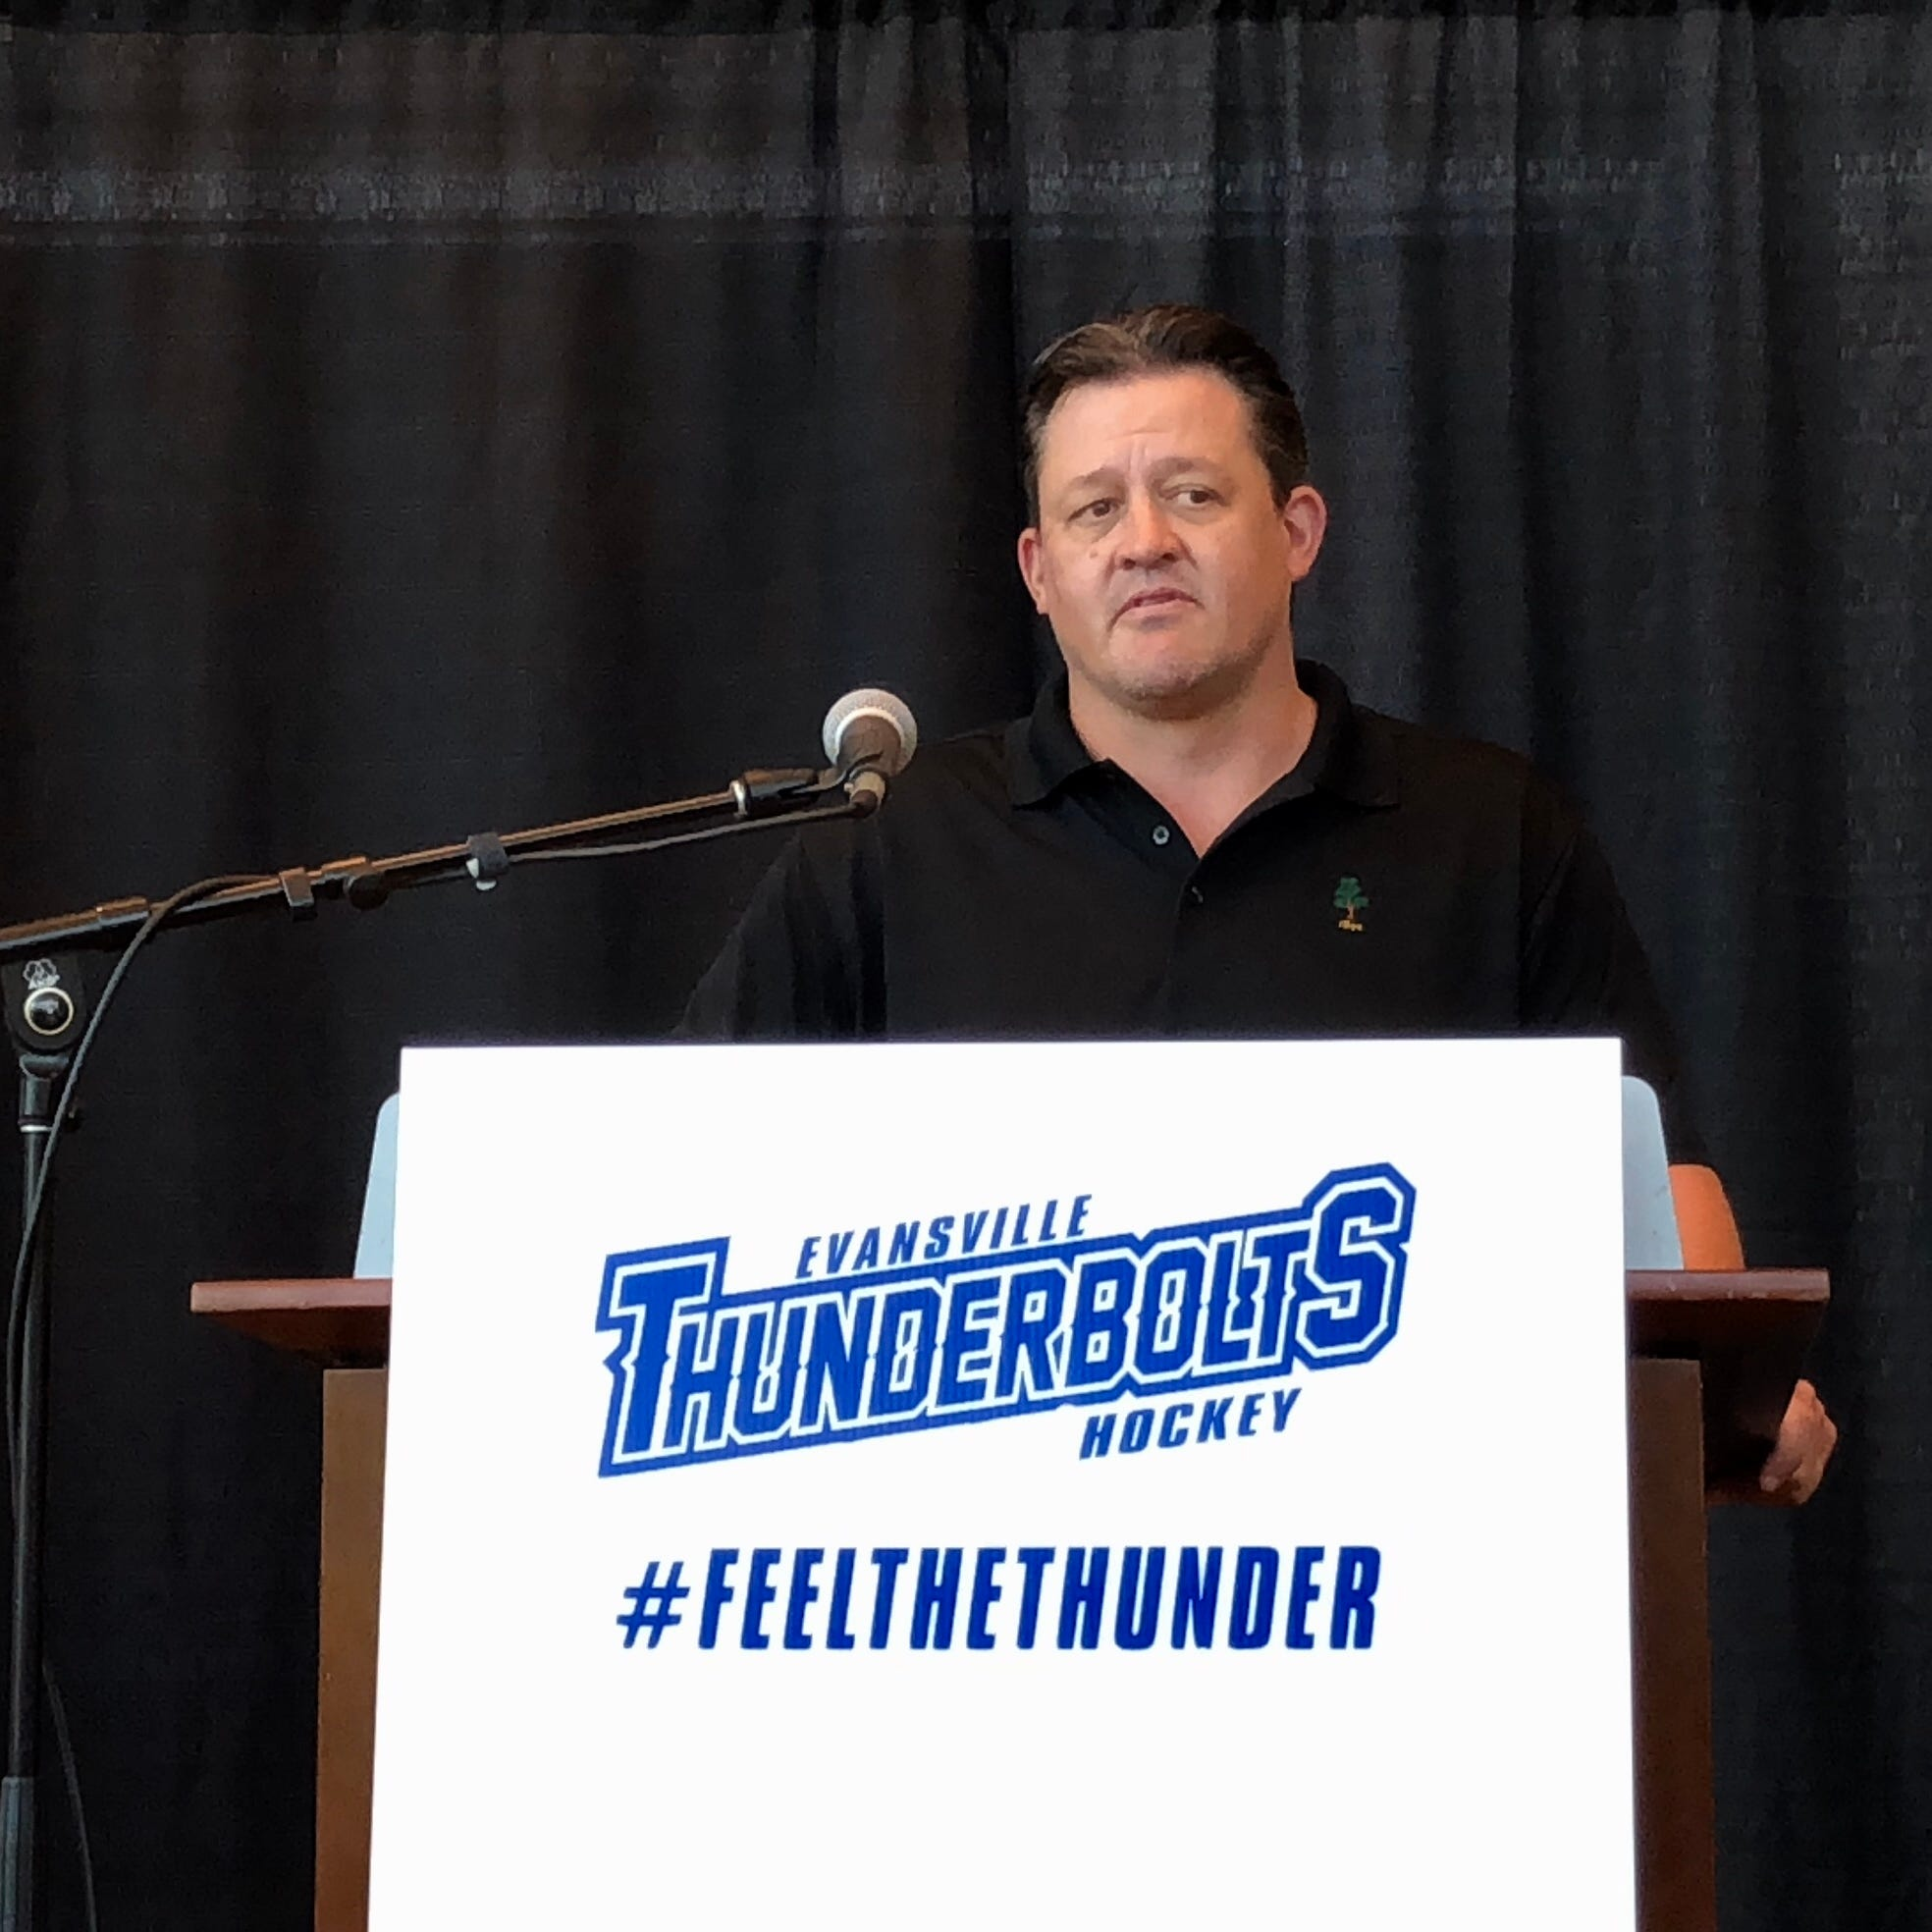 New Thunderbolts coach Ian Moran brings NHL expertise | Lindskog